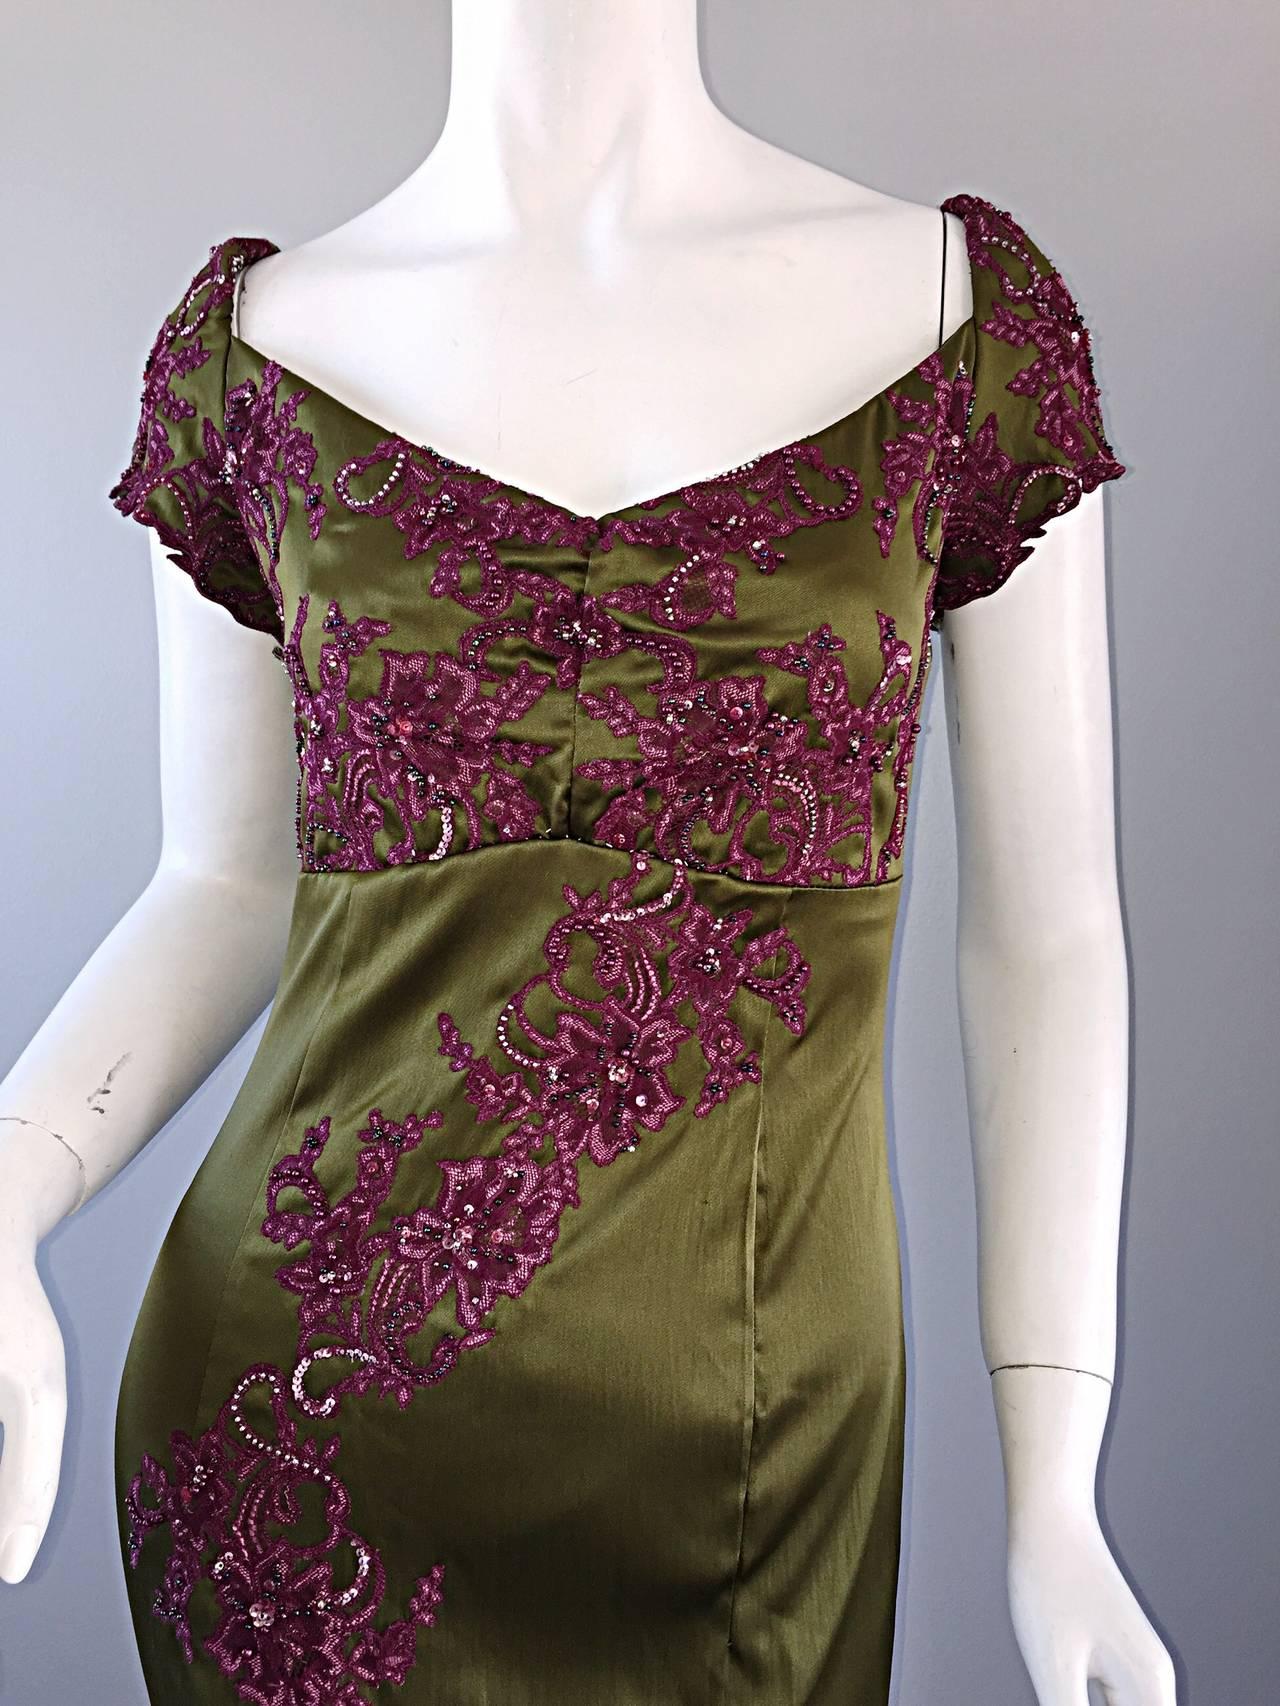 Brown Beautiful Mandalay Chartreuse Merlot Sz 6 Silk Bombshell Dress w/ Beading & Lace For Sale